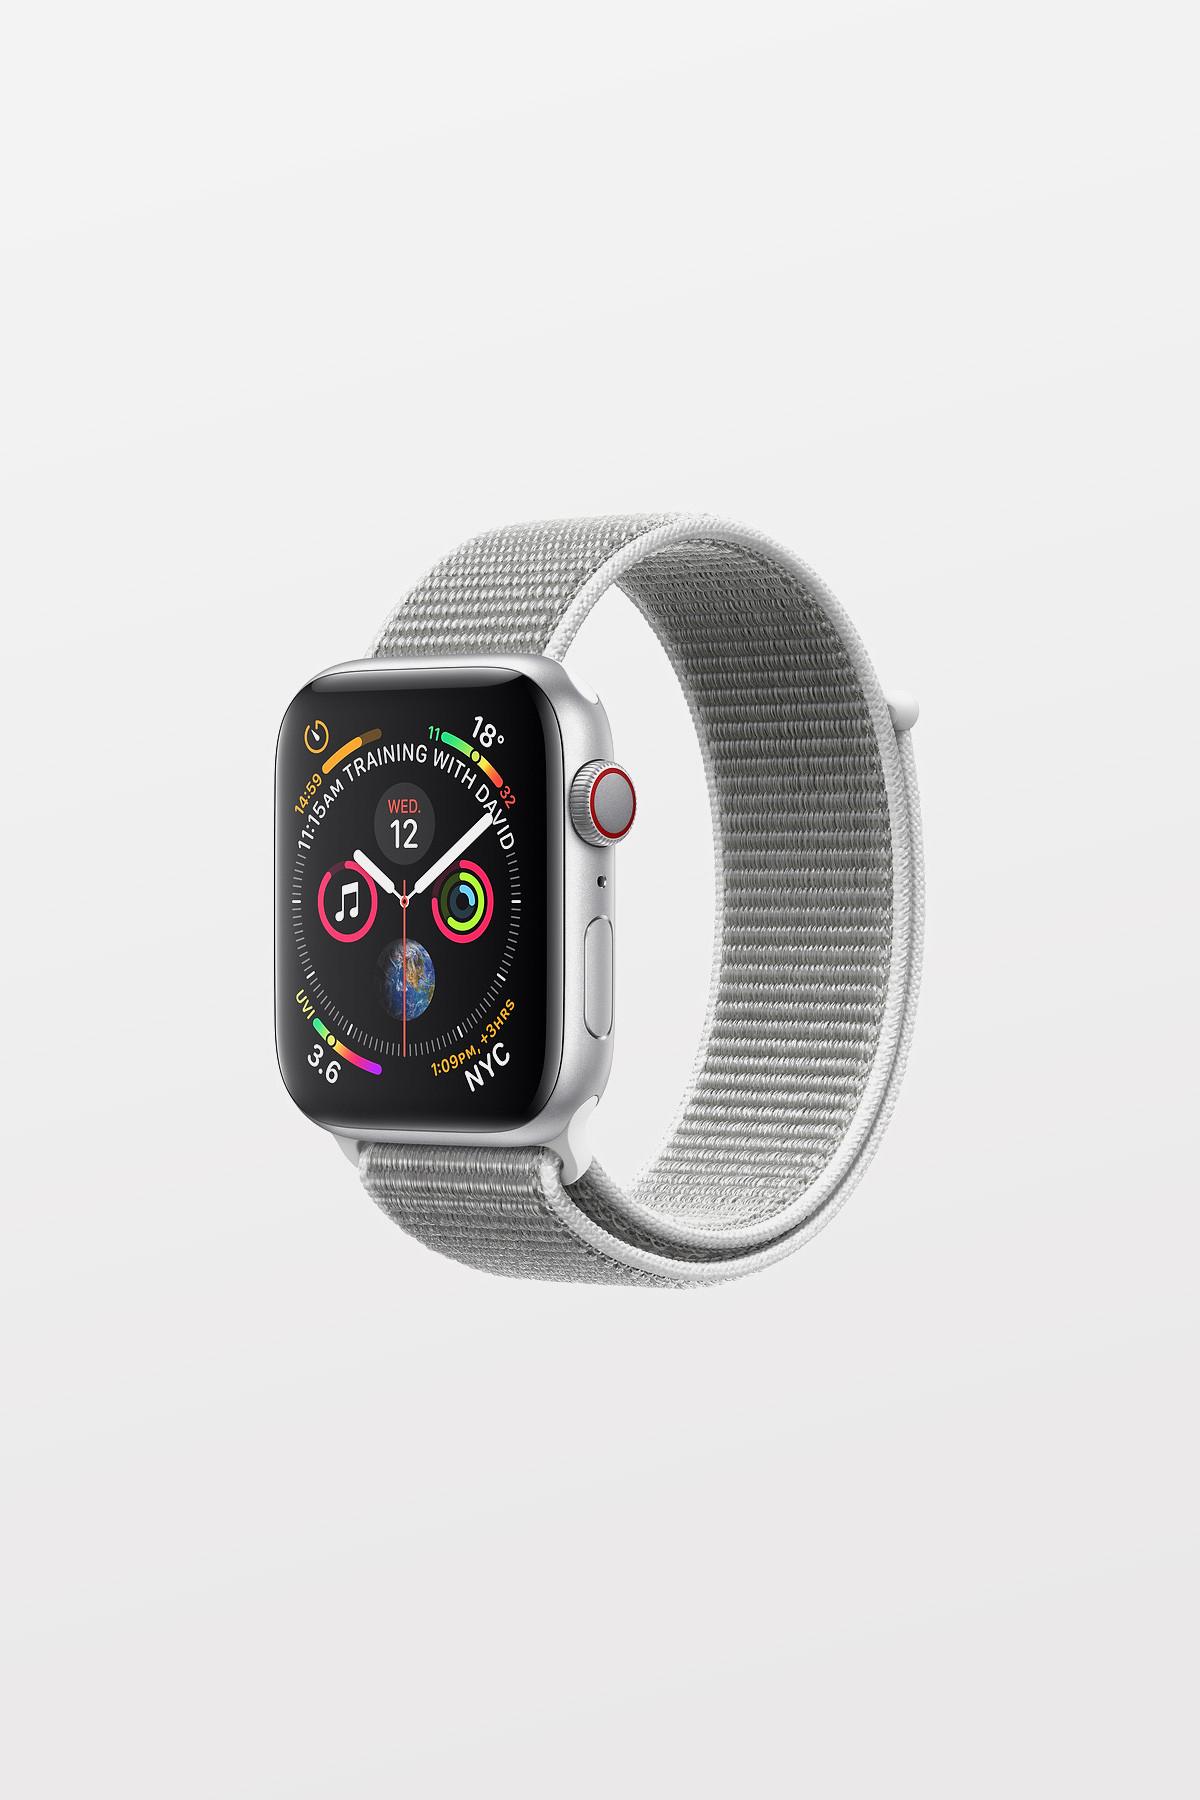 Apple Watch Series 4 Cellular - 40mm - Silver Aluminium Case with Seashell Sport Loop